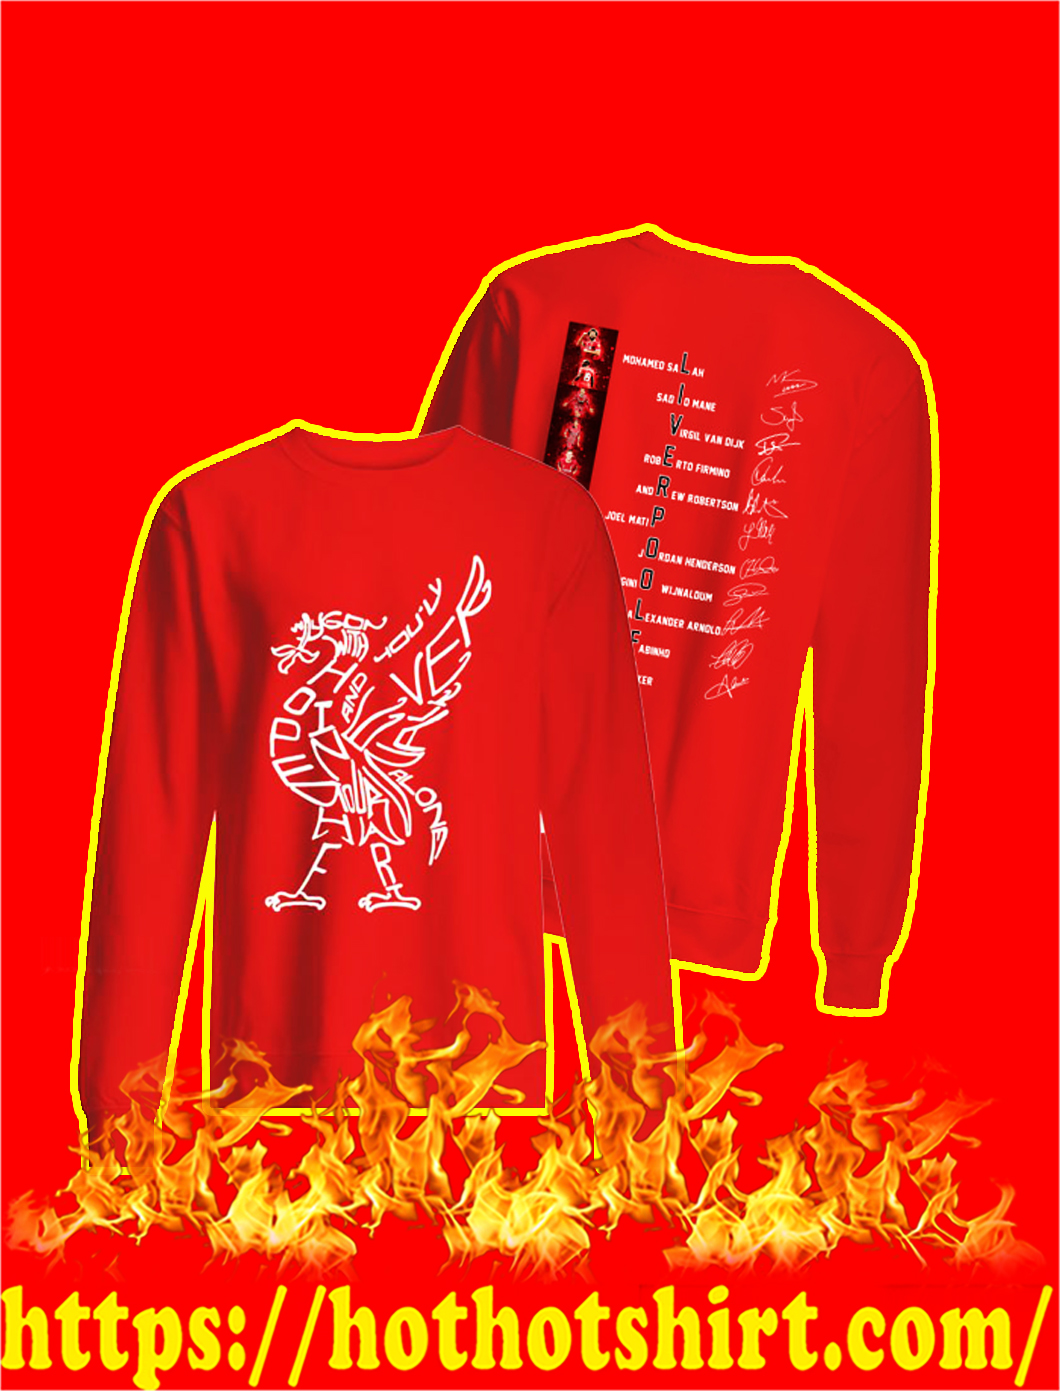 Liverpool FC Players Signature sweatshirt